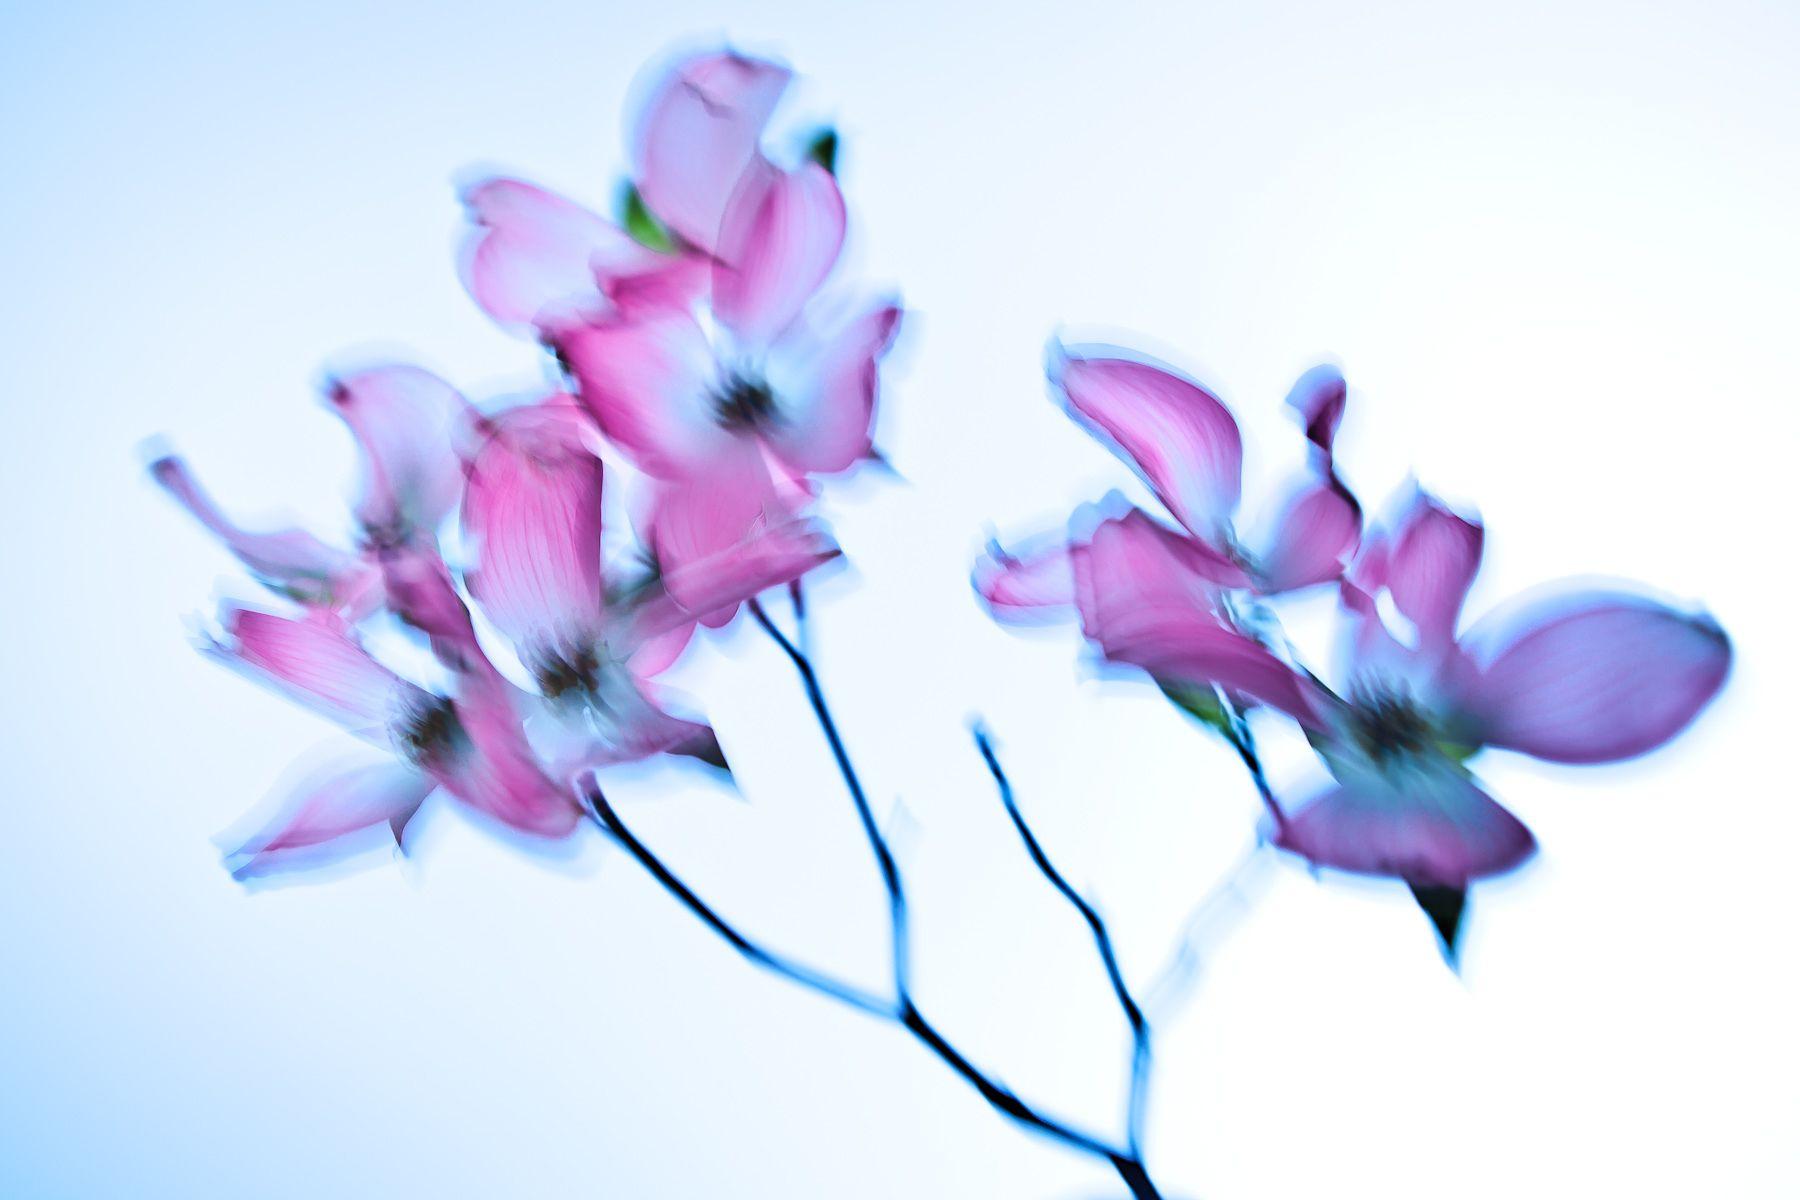 1flowers__d85697.jpg